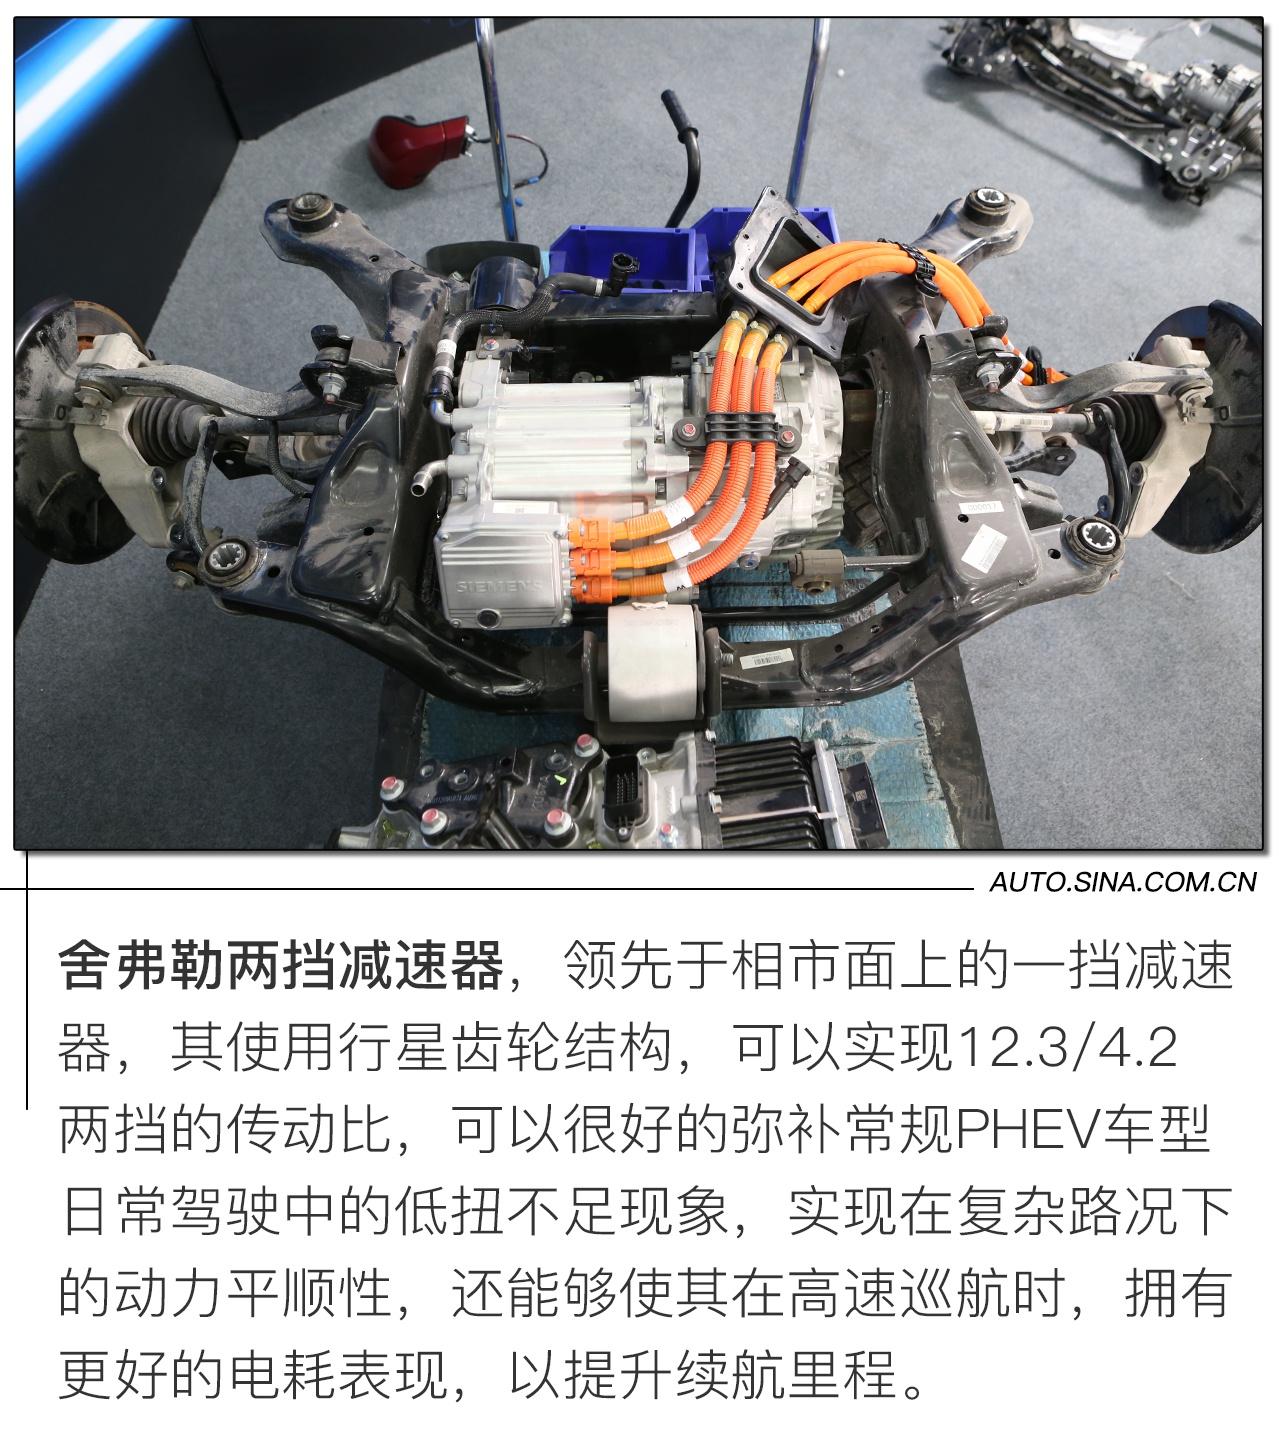 WEY VV7 GT PHEV实车拆解 解密核心技术实力